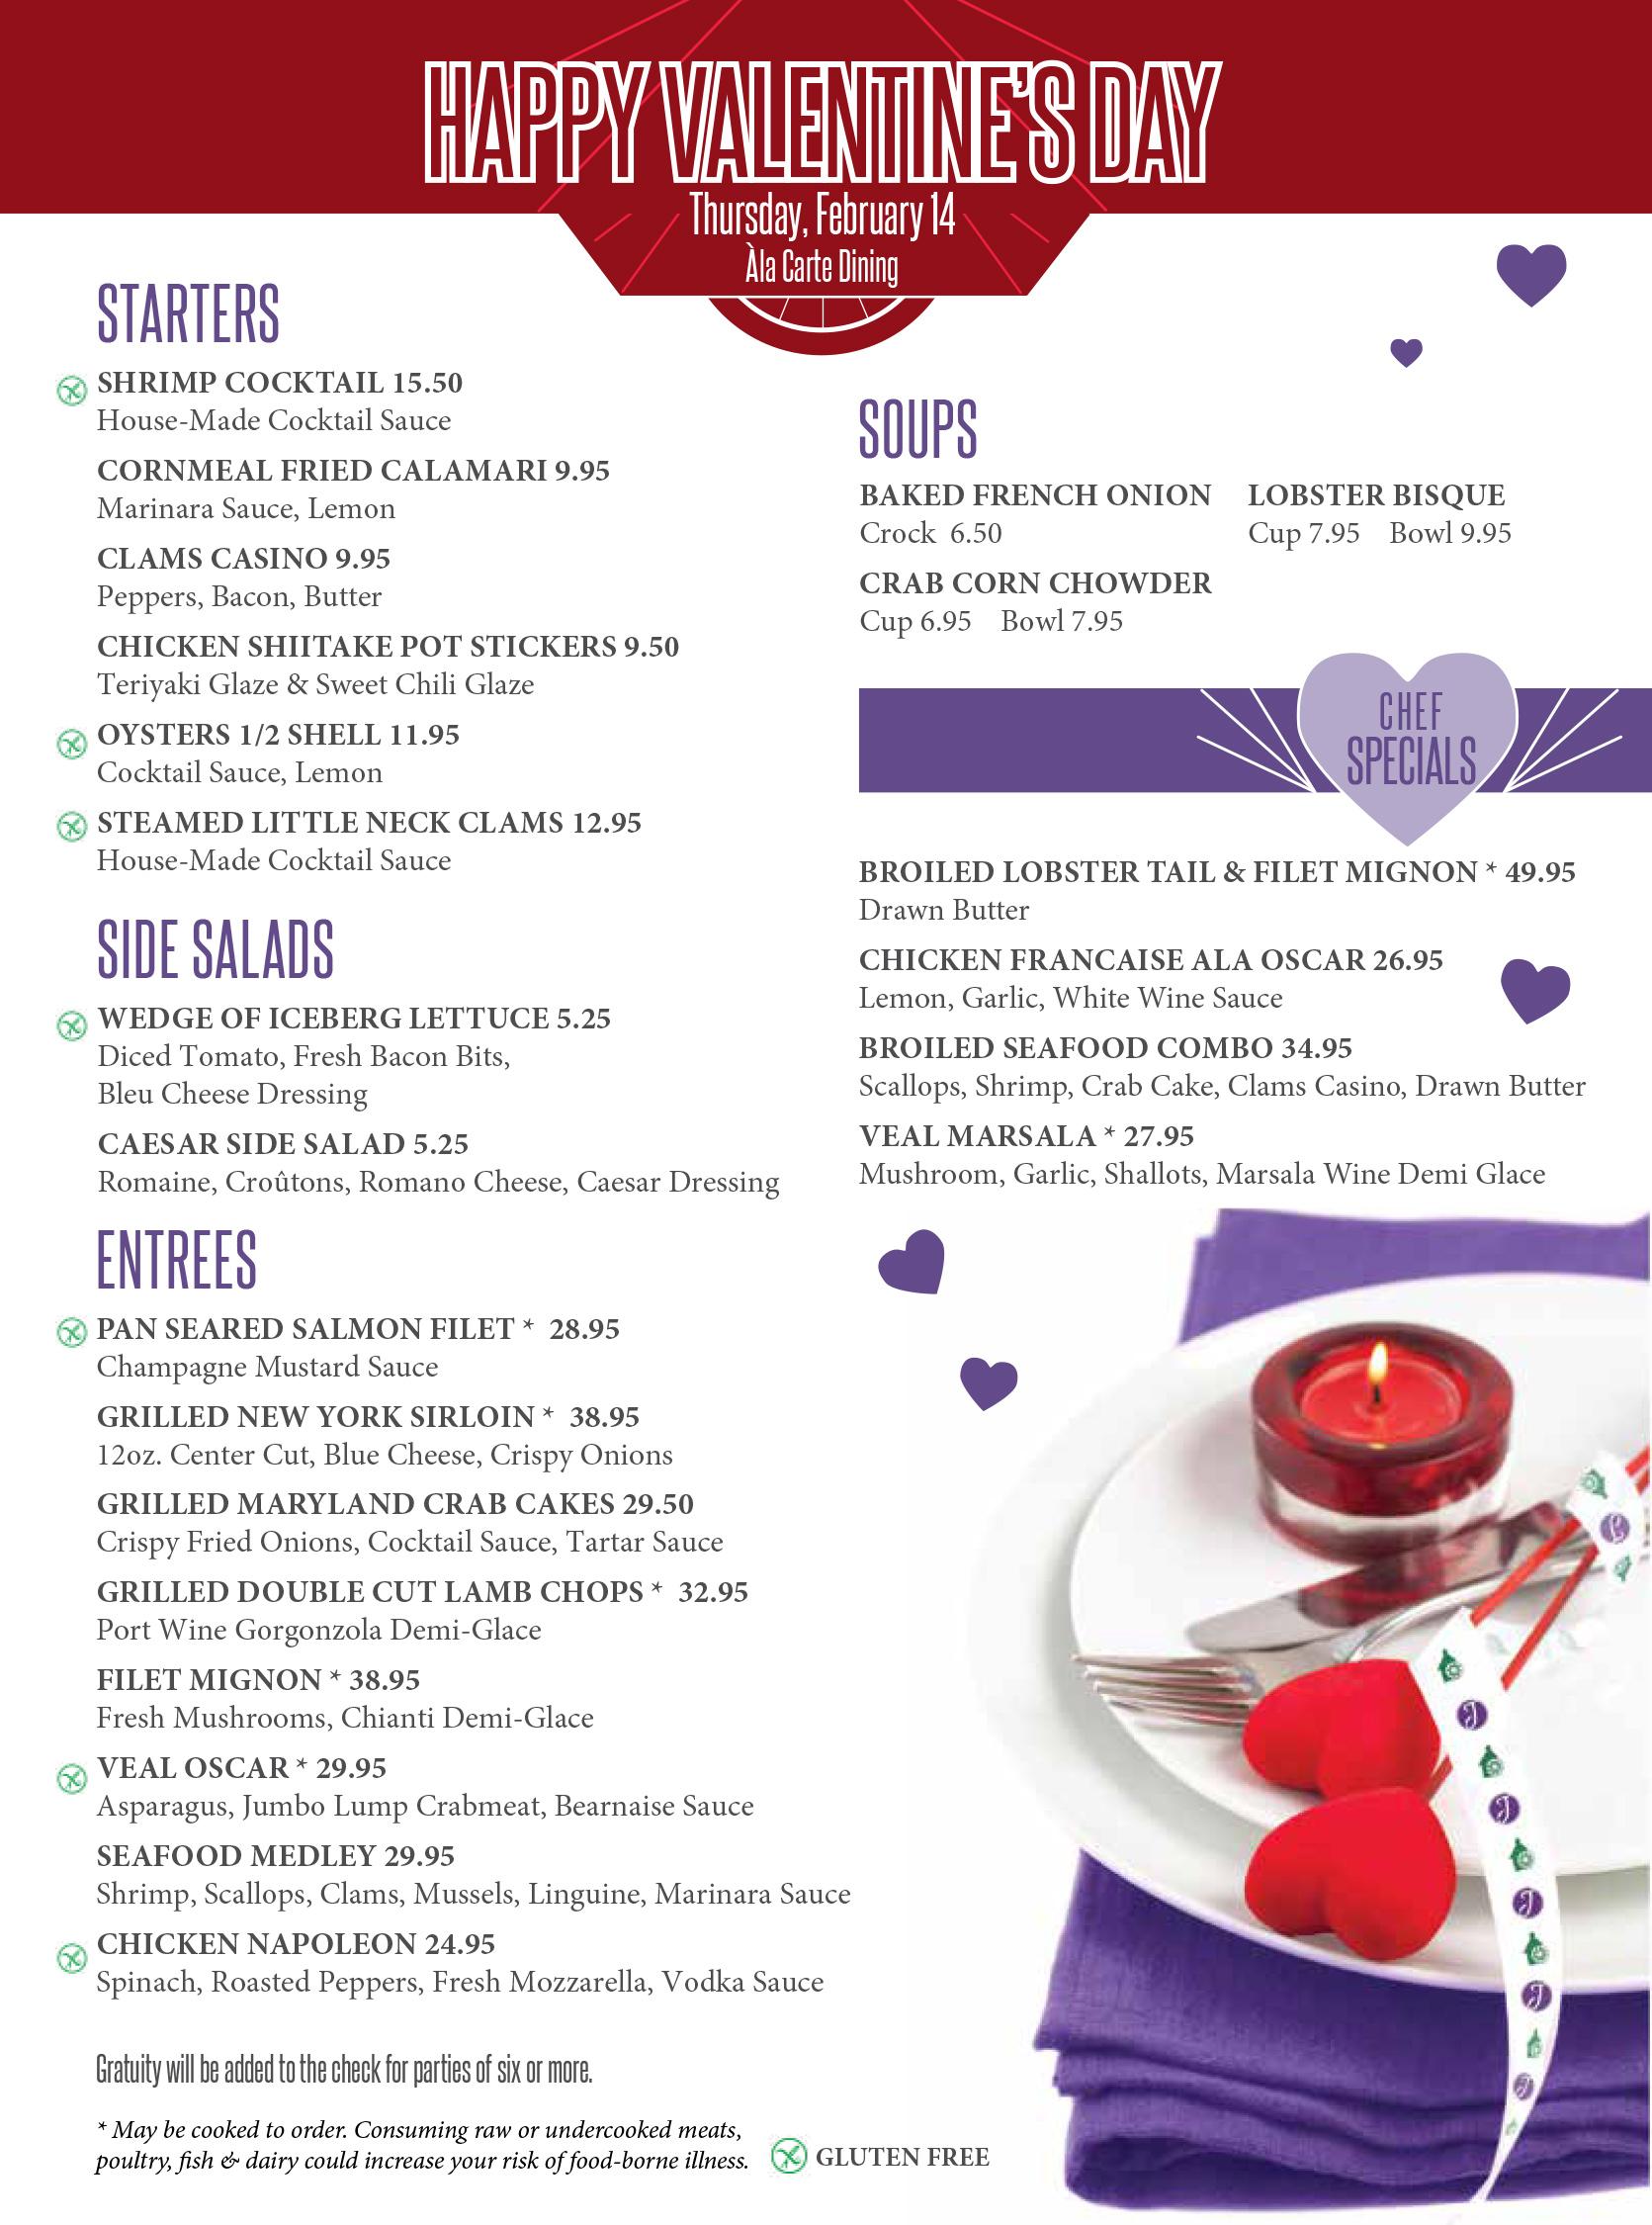 2019_Valentines_Day_SpringMill_menu.jpg